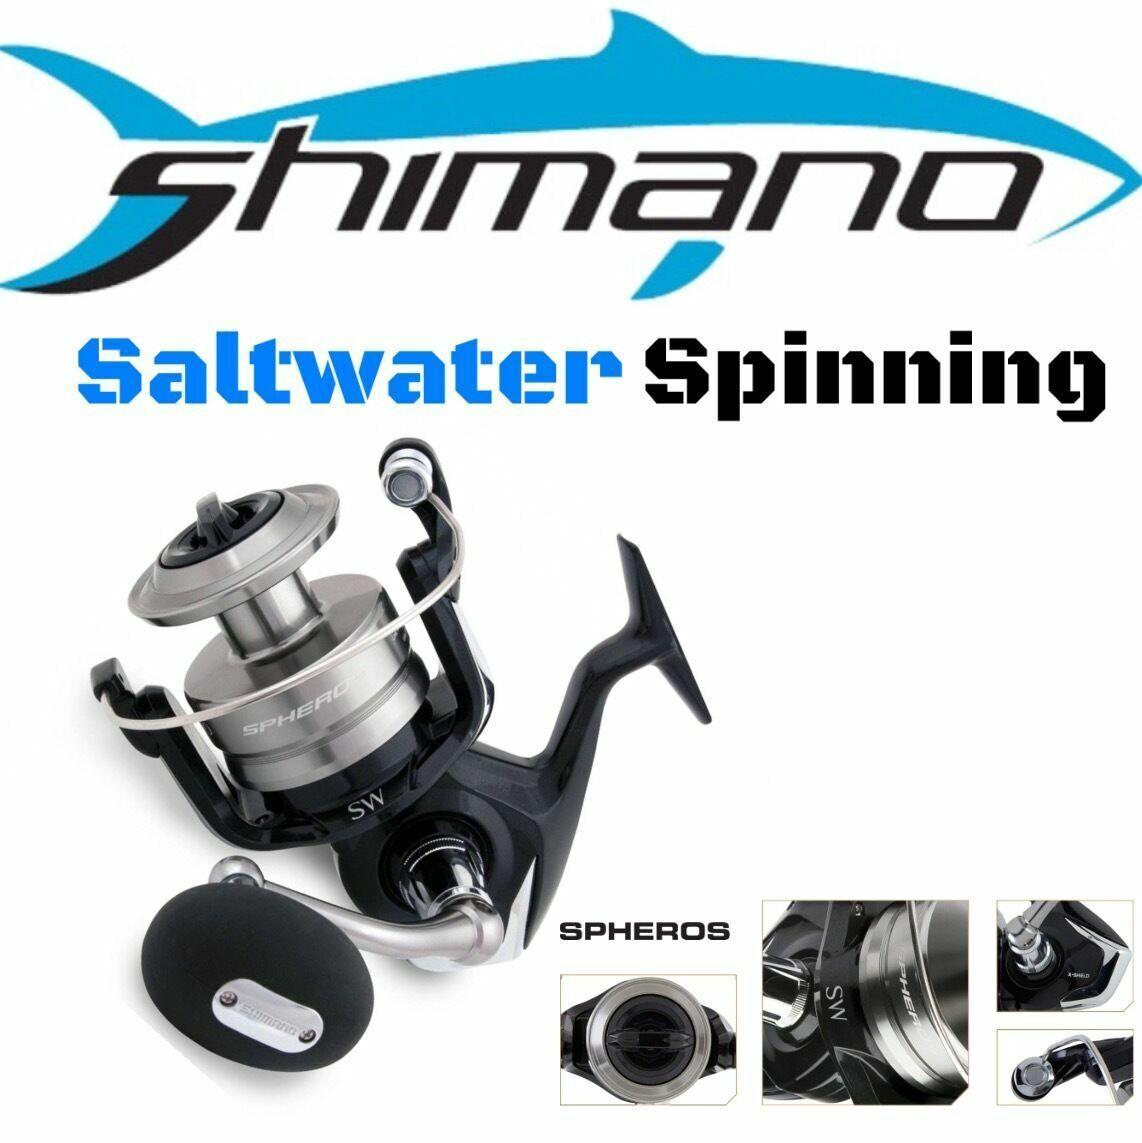 Shimano Saltwater spinning Reel spheros sw6000-sw20000